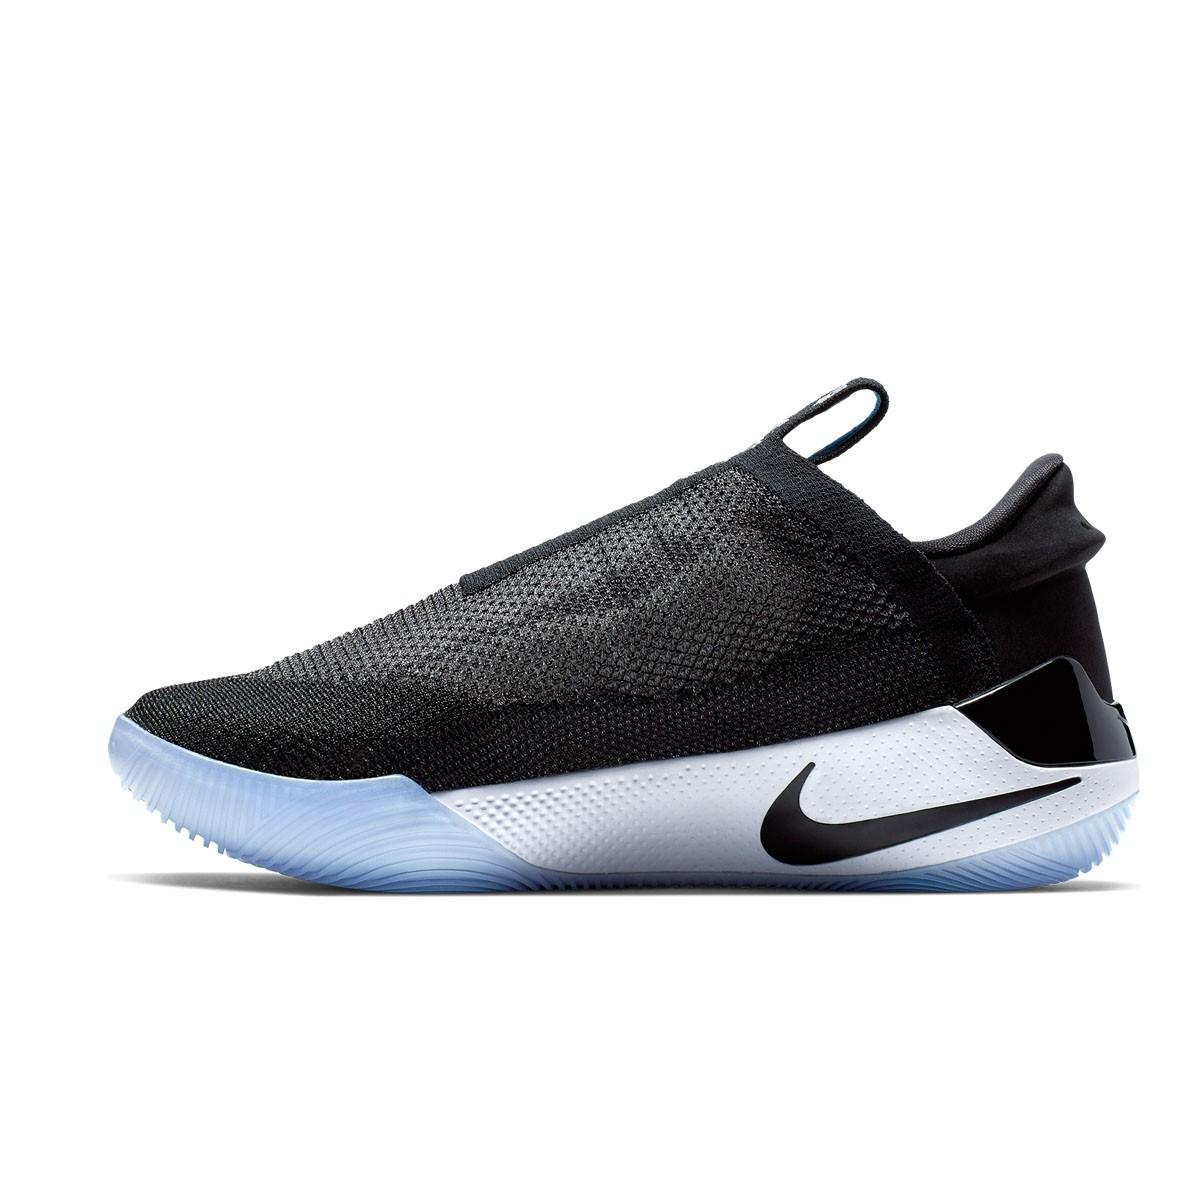 Nike Adapt BB 'Black Pure Platinum'